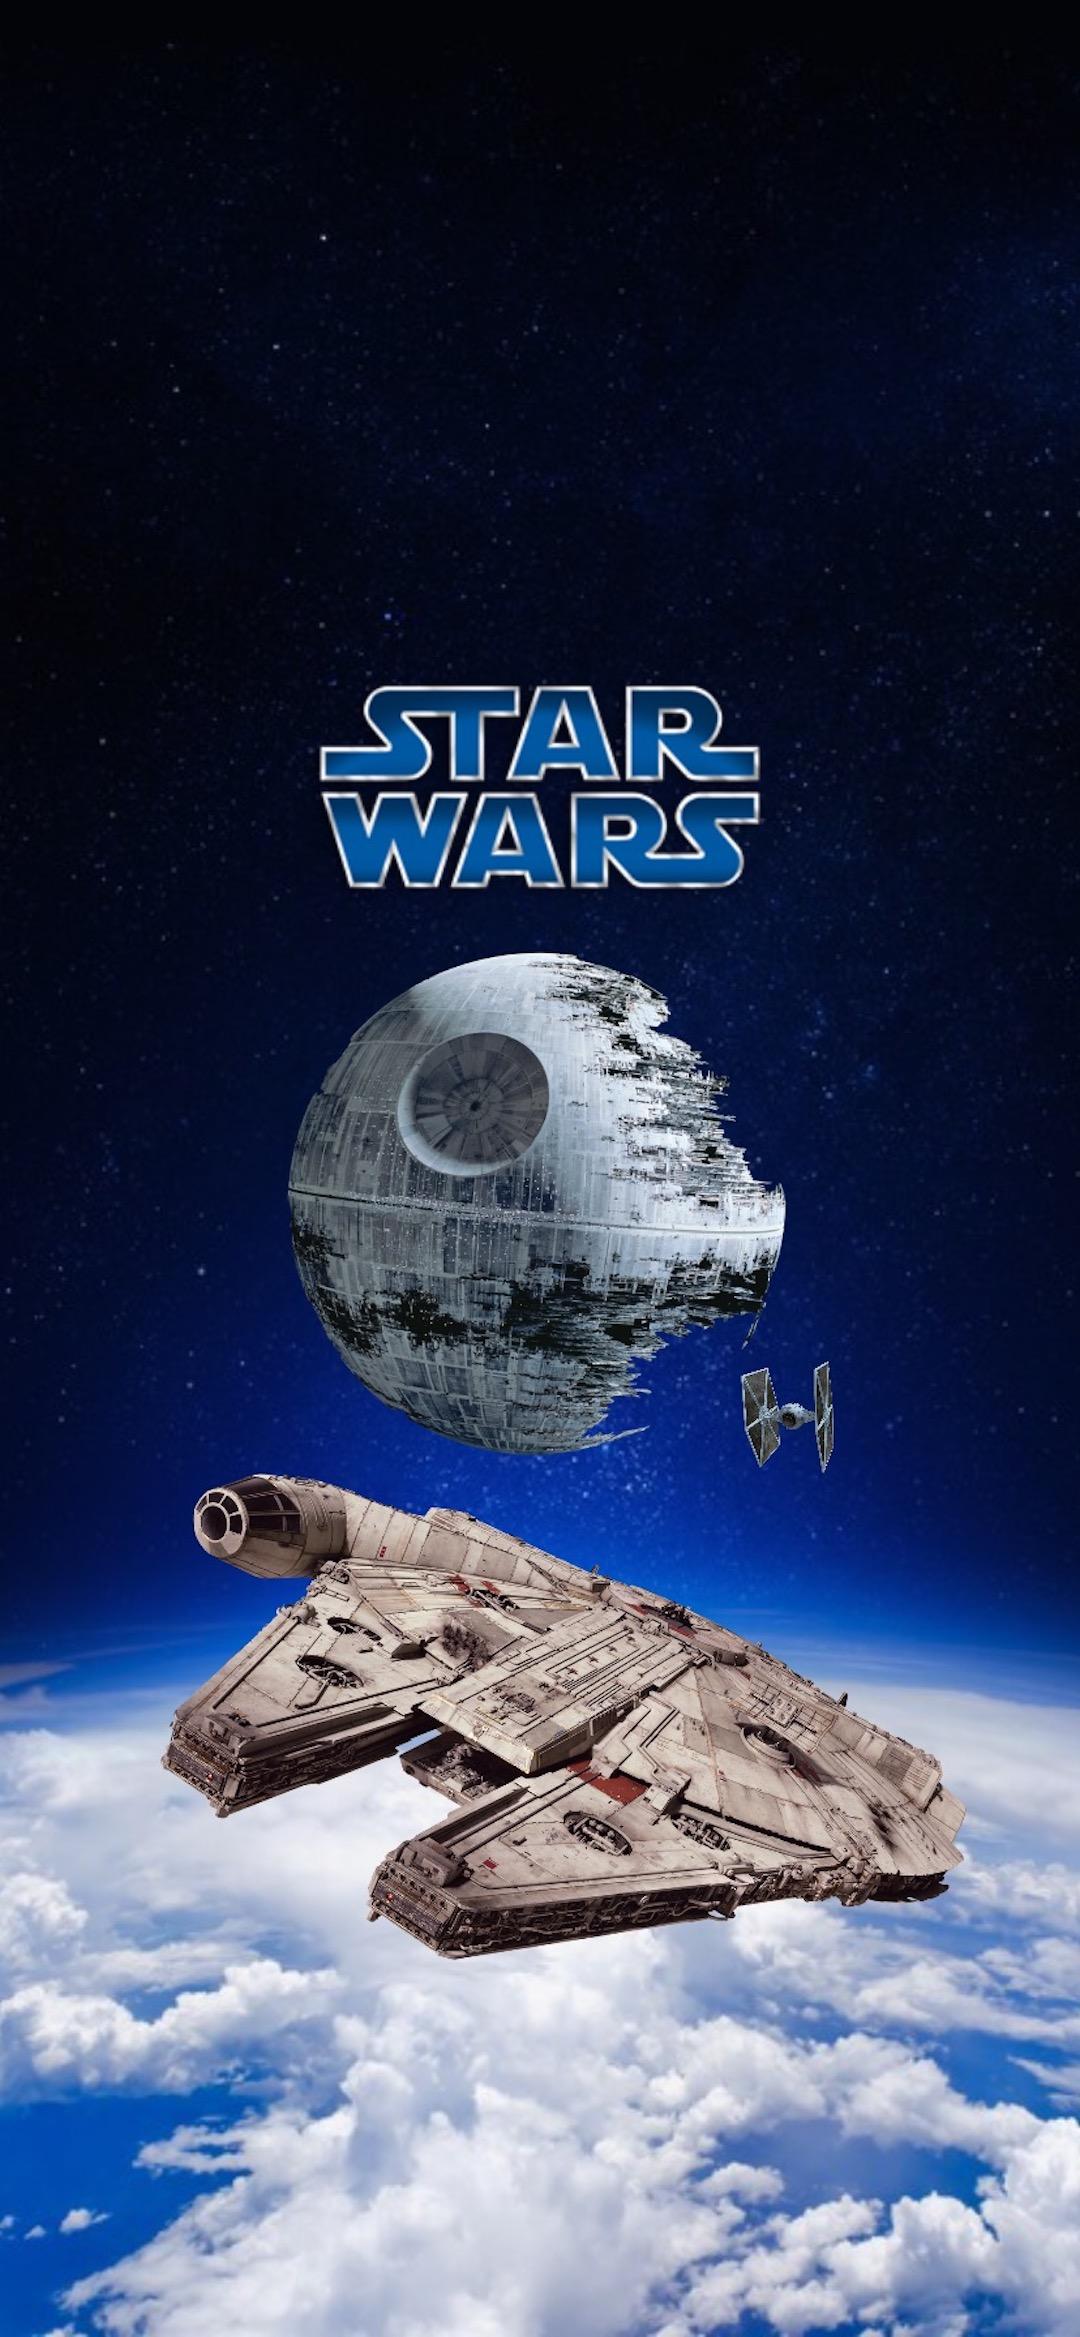 Star 5 6 2 4 Wars 3 7 1